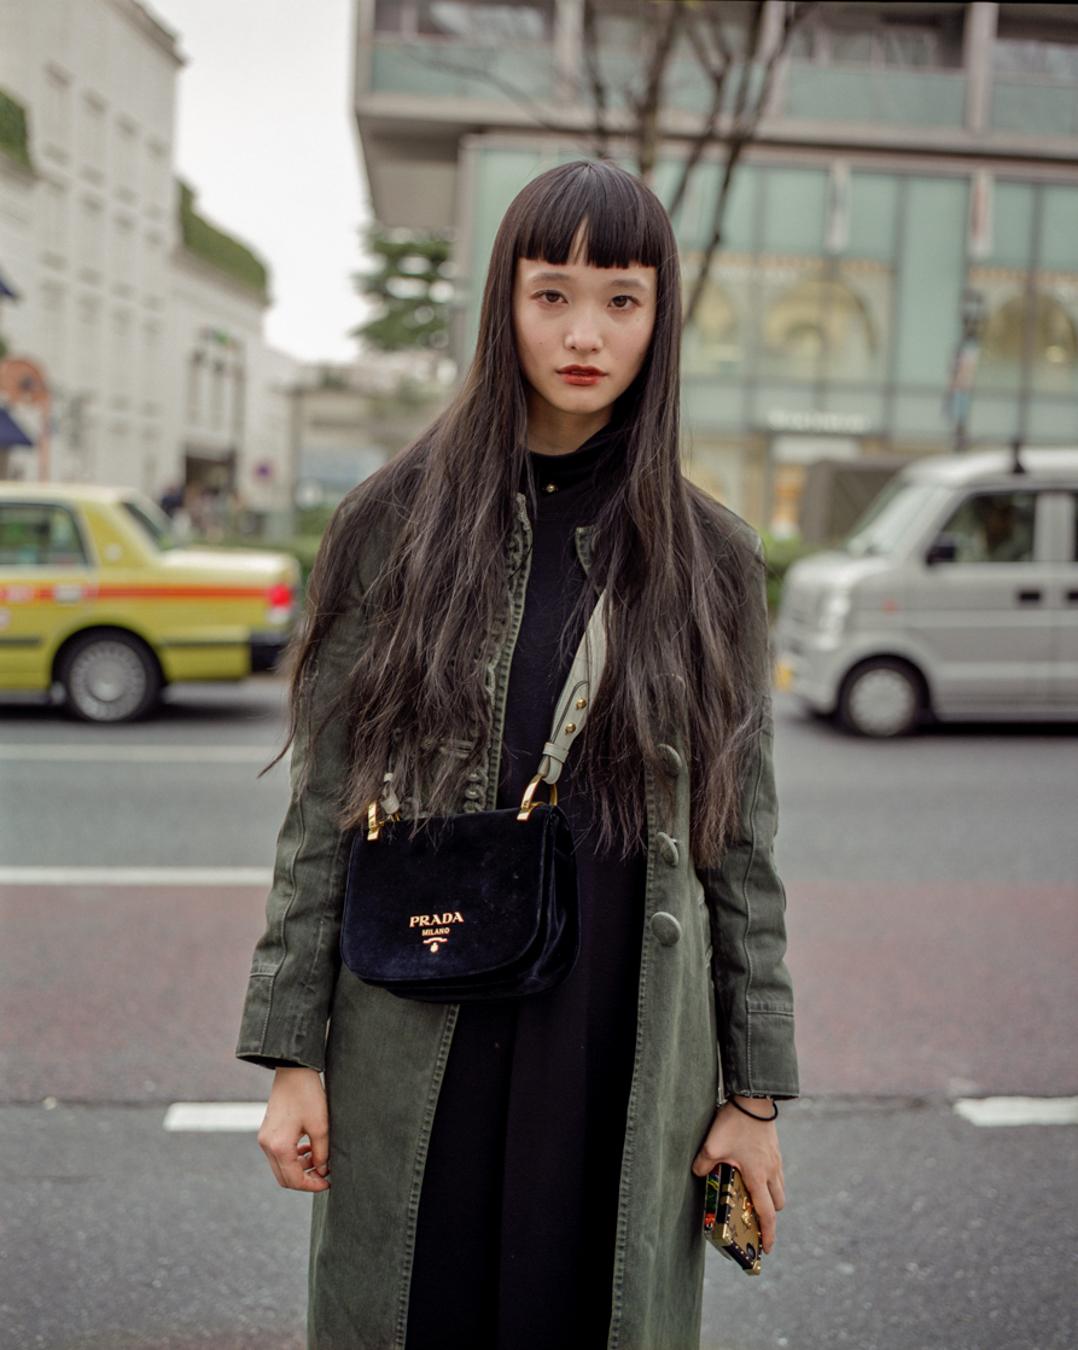 Yuka Manami, a Japanese model with a vintage Prada bag in Omotesando